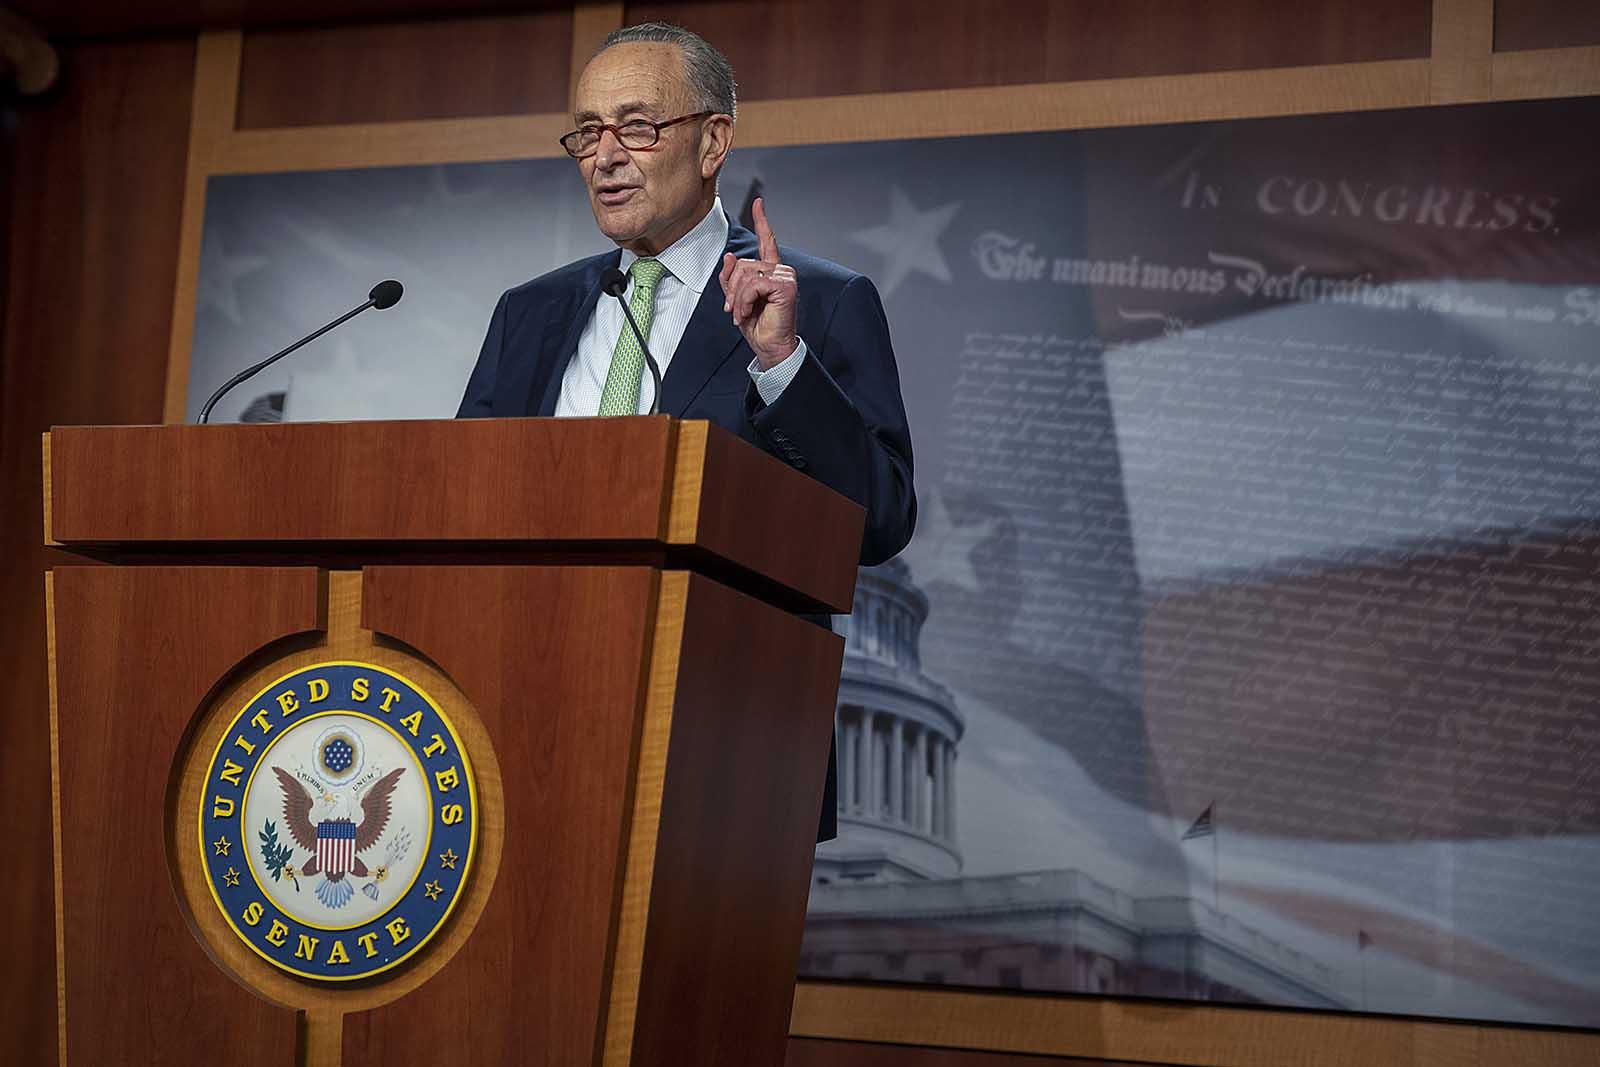 Senate Minority Leader Sen. Chuck Schumer speaks at a news conference on October 1, in Washington.